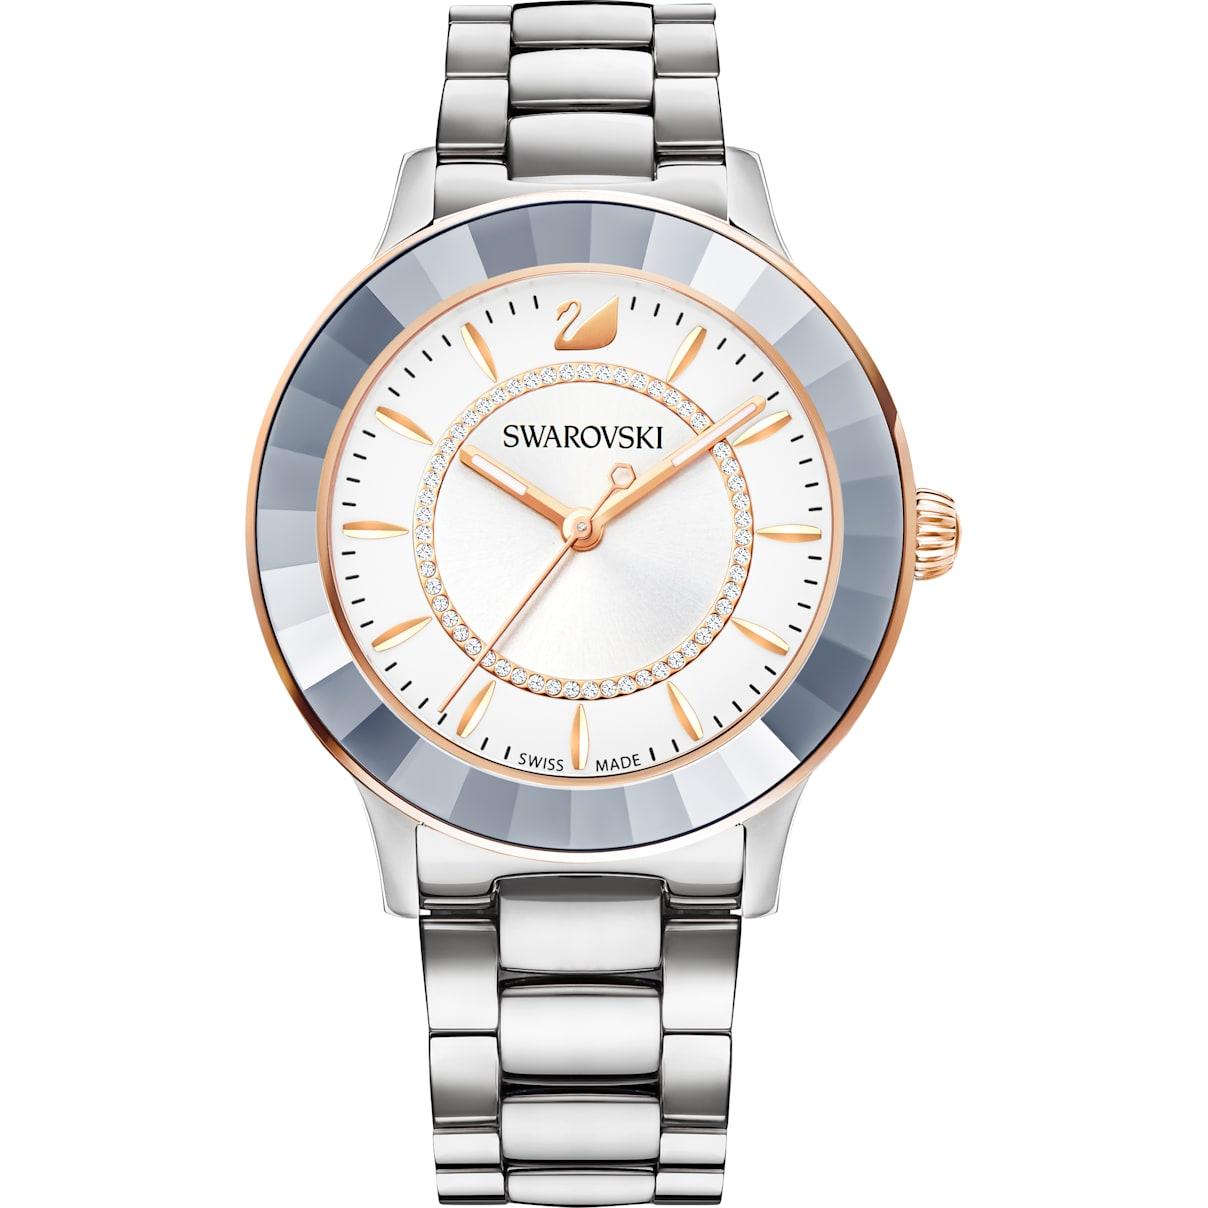 Swarovski Octea Lux Watch, Metal bracelet, Stainless steel